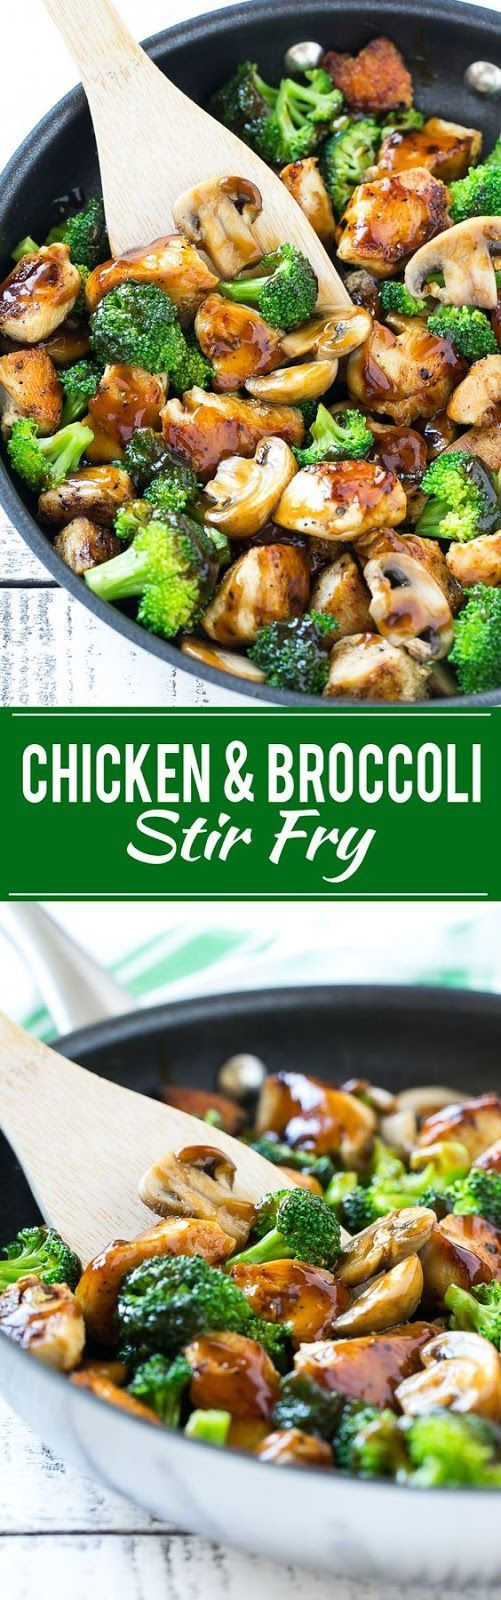 Chicken and Broccoli Stir Fry: